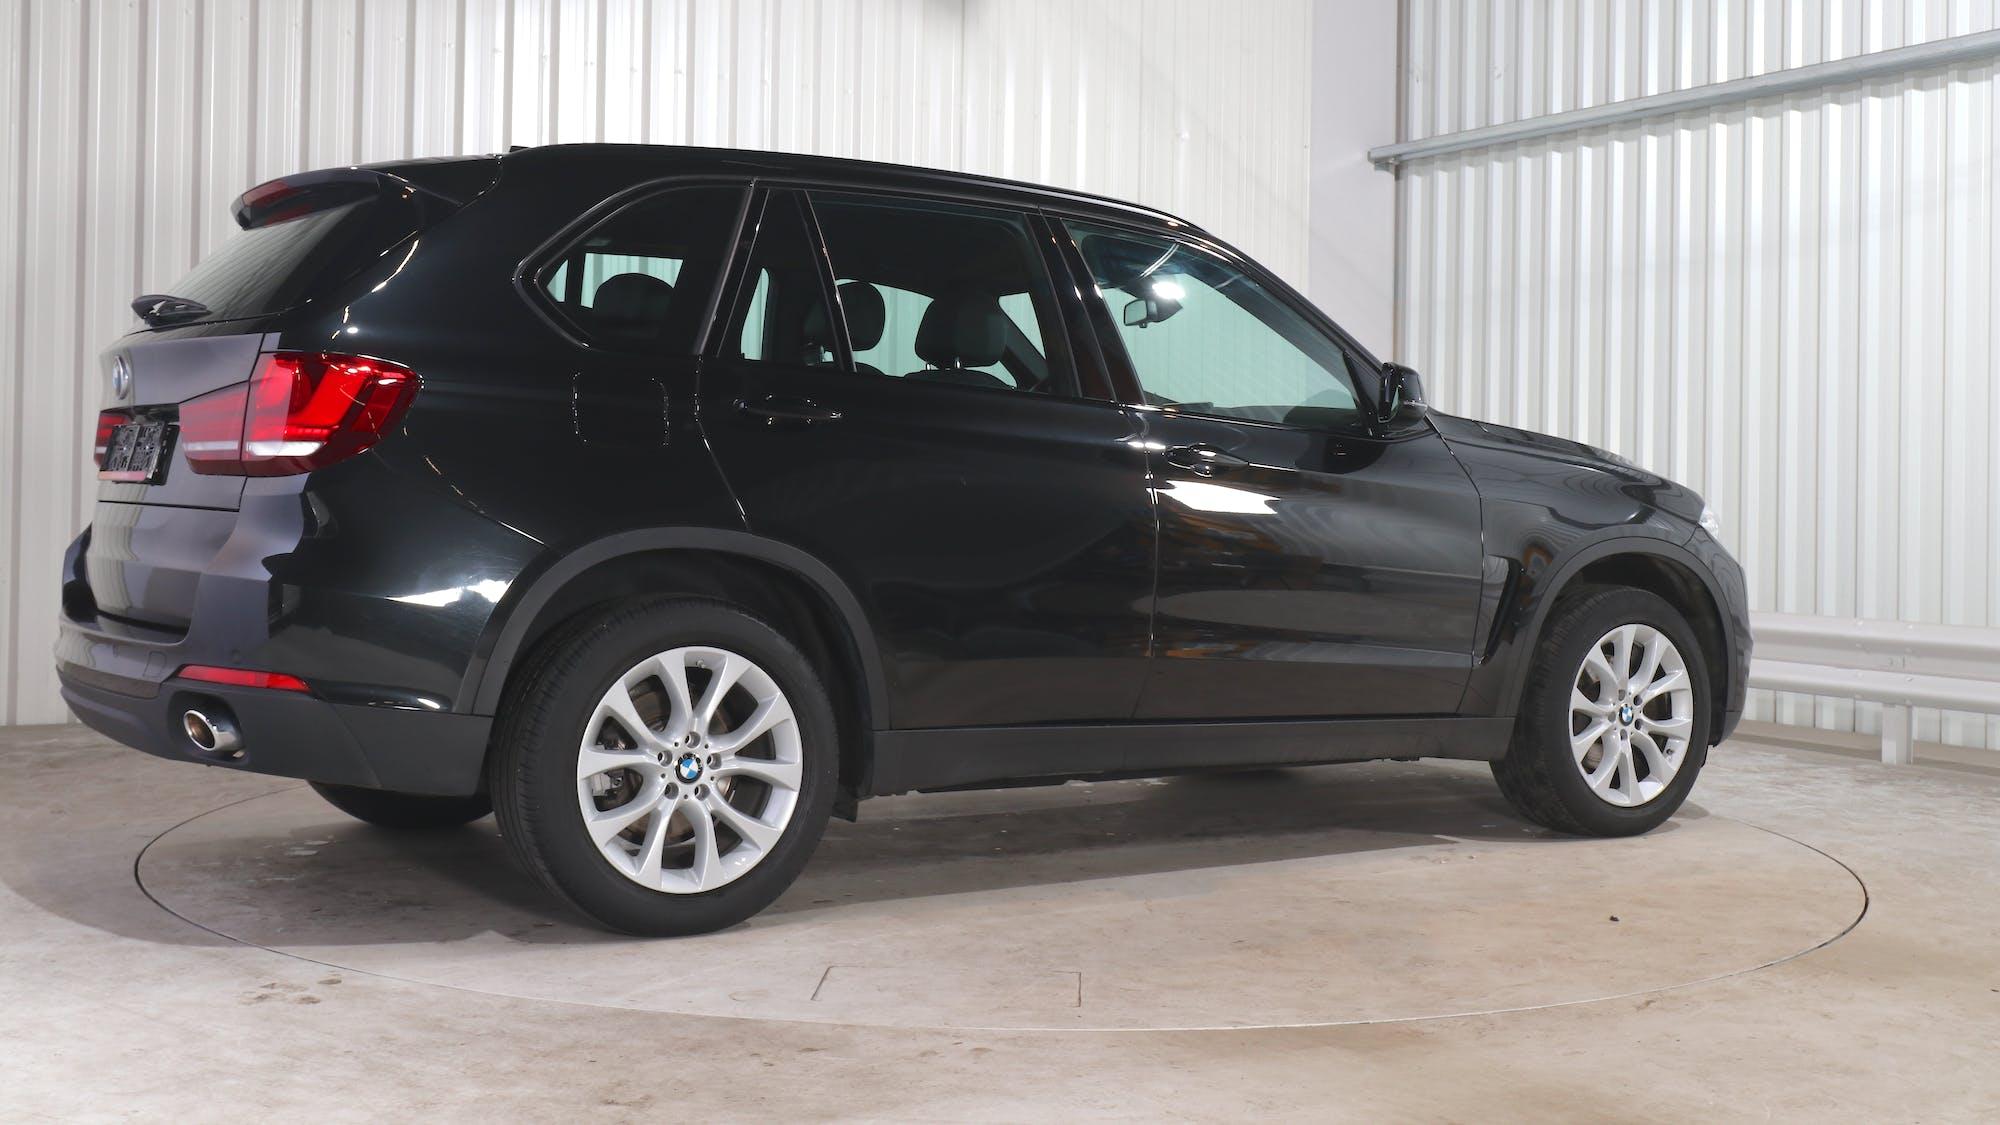 BMW X5 leasing exterior 7